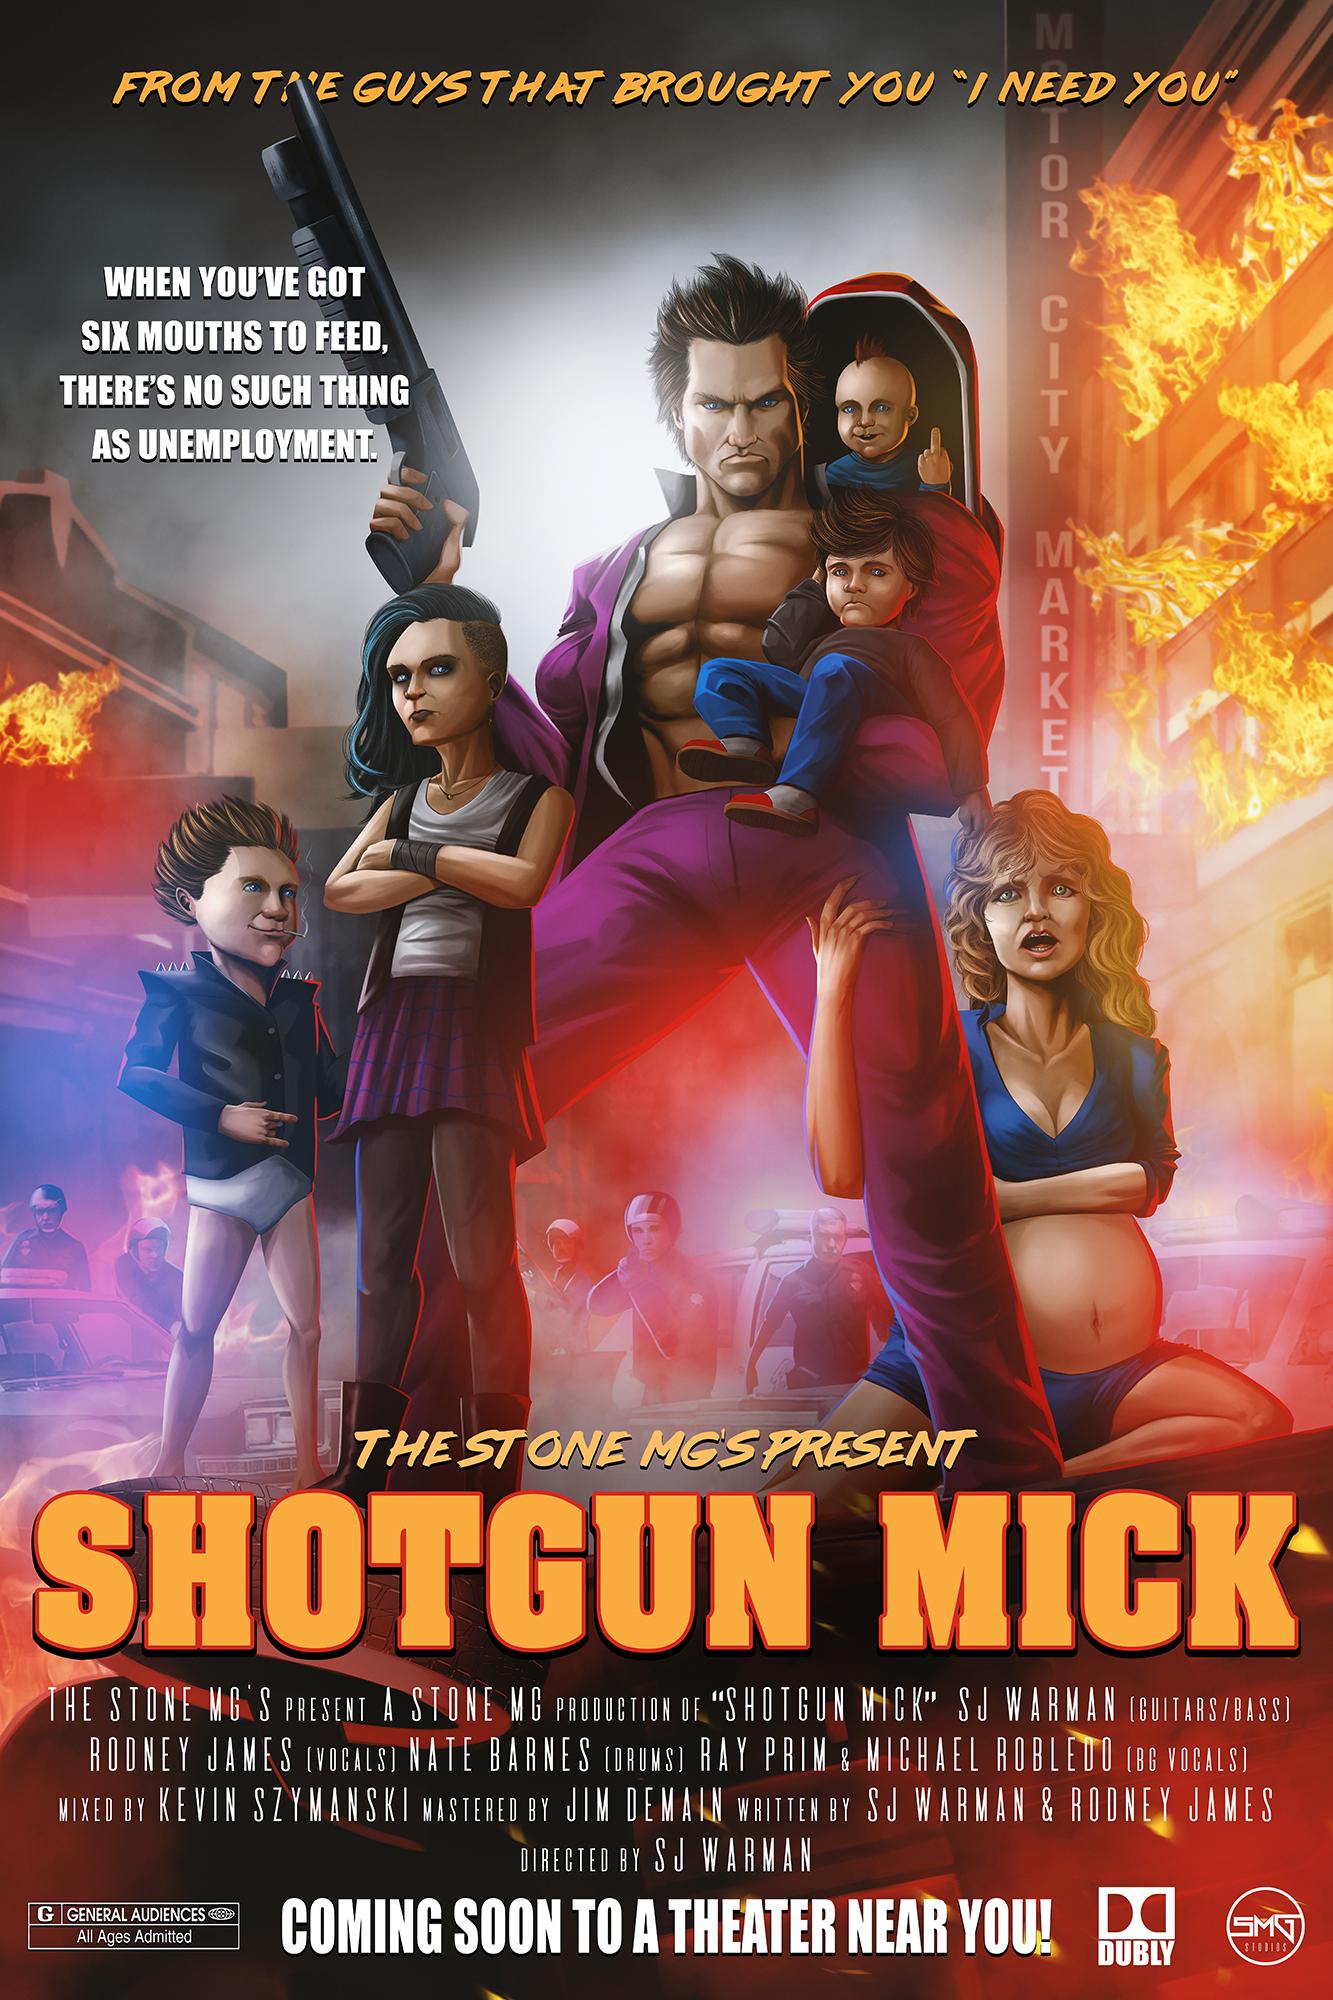 Shotgun Mick Poster The Stone MGs